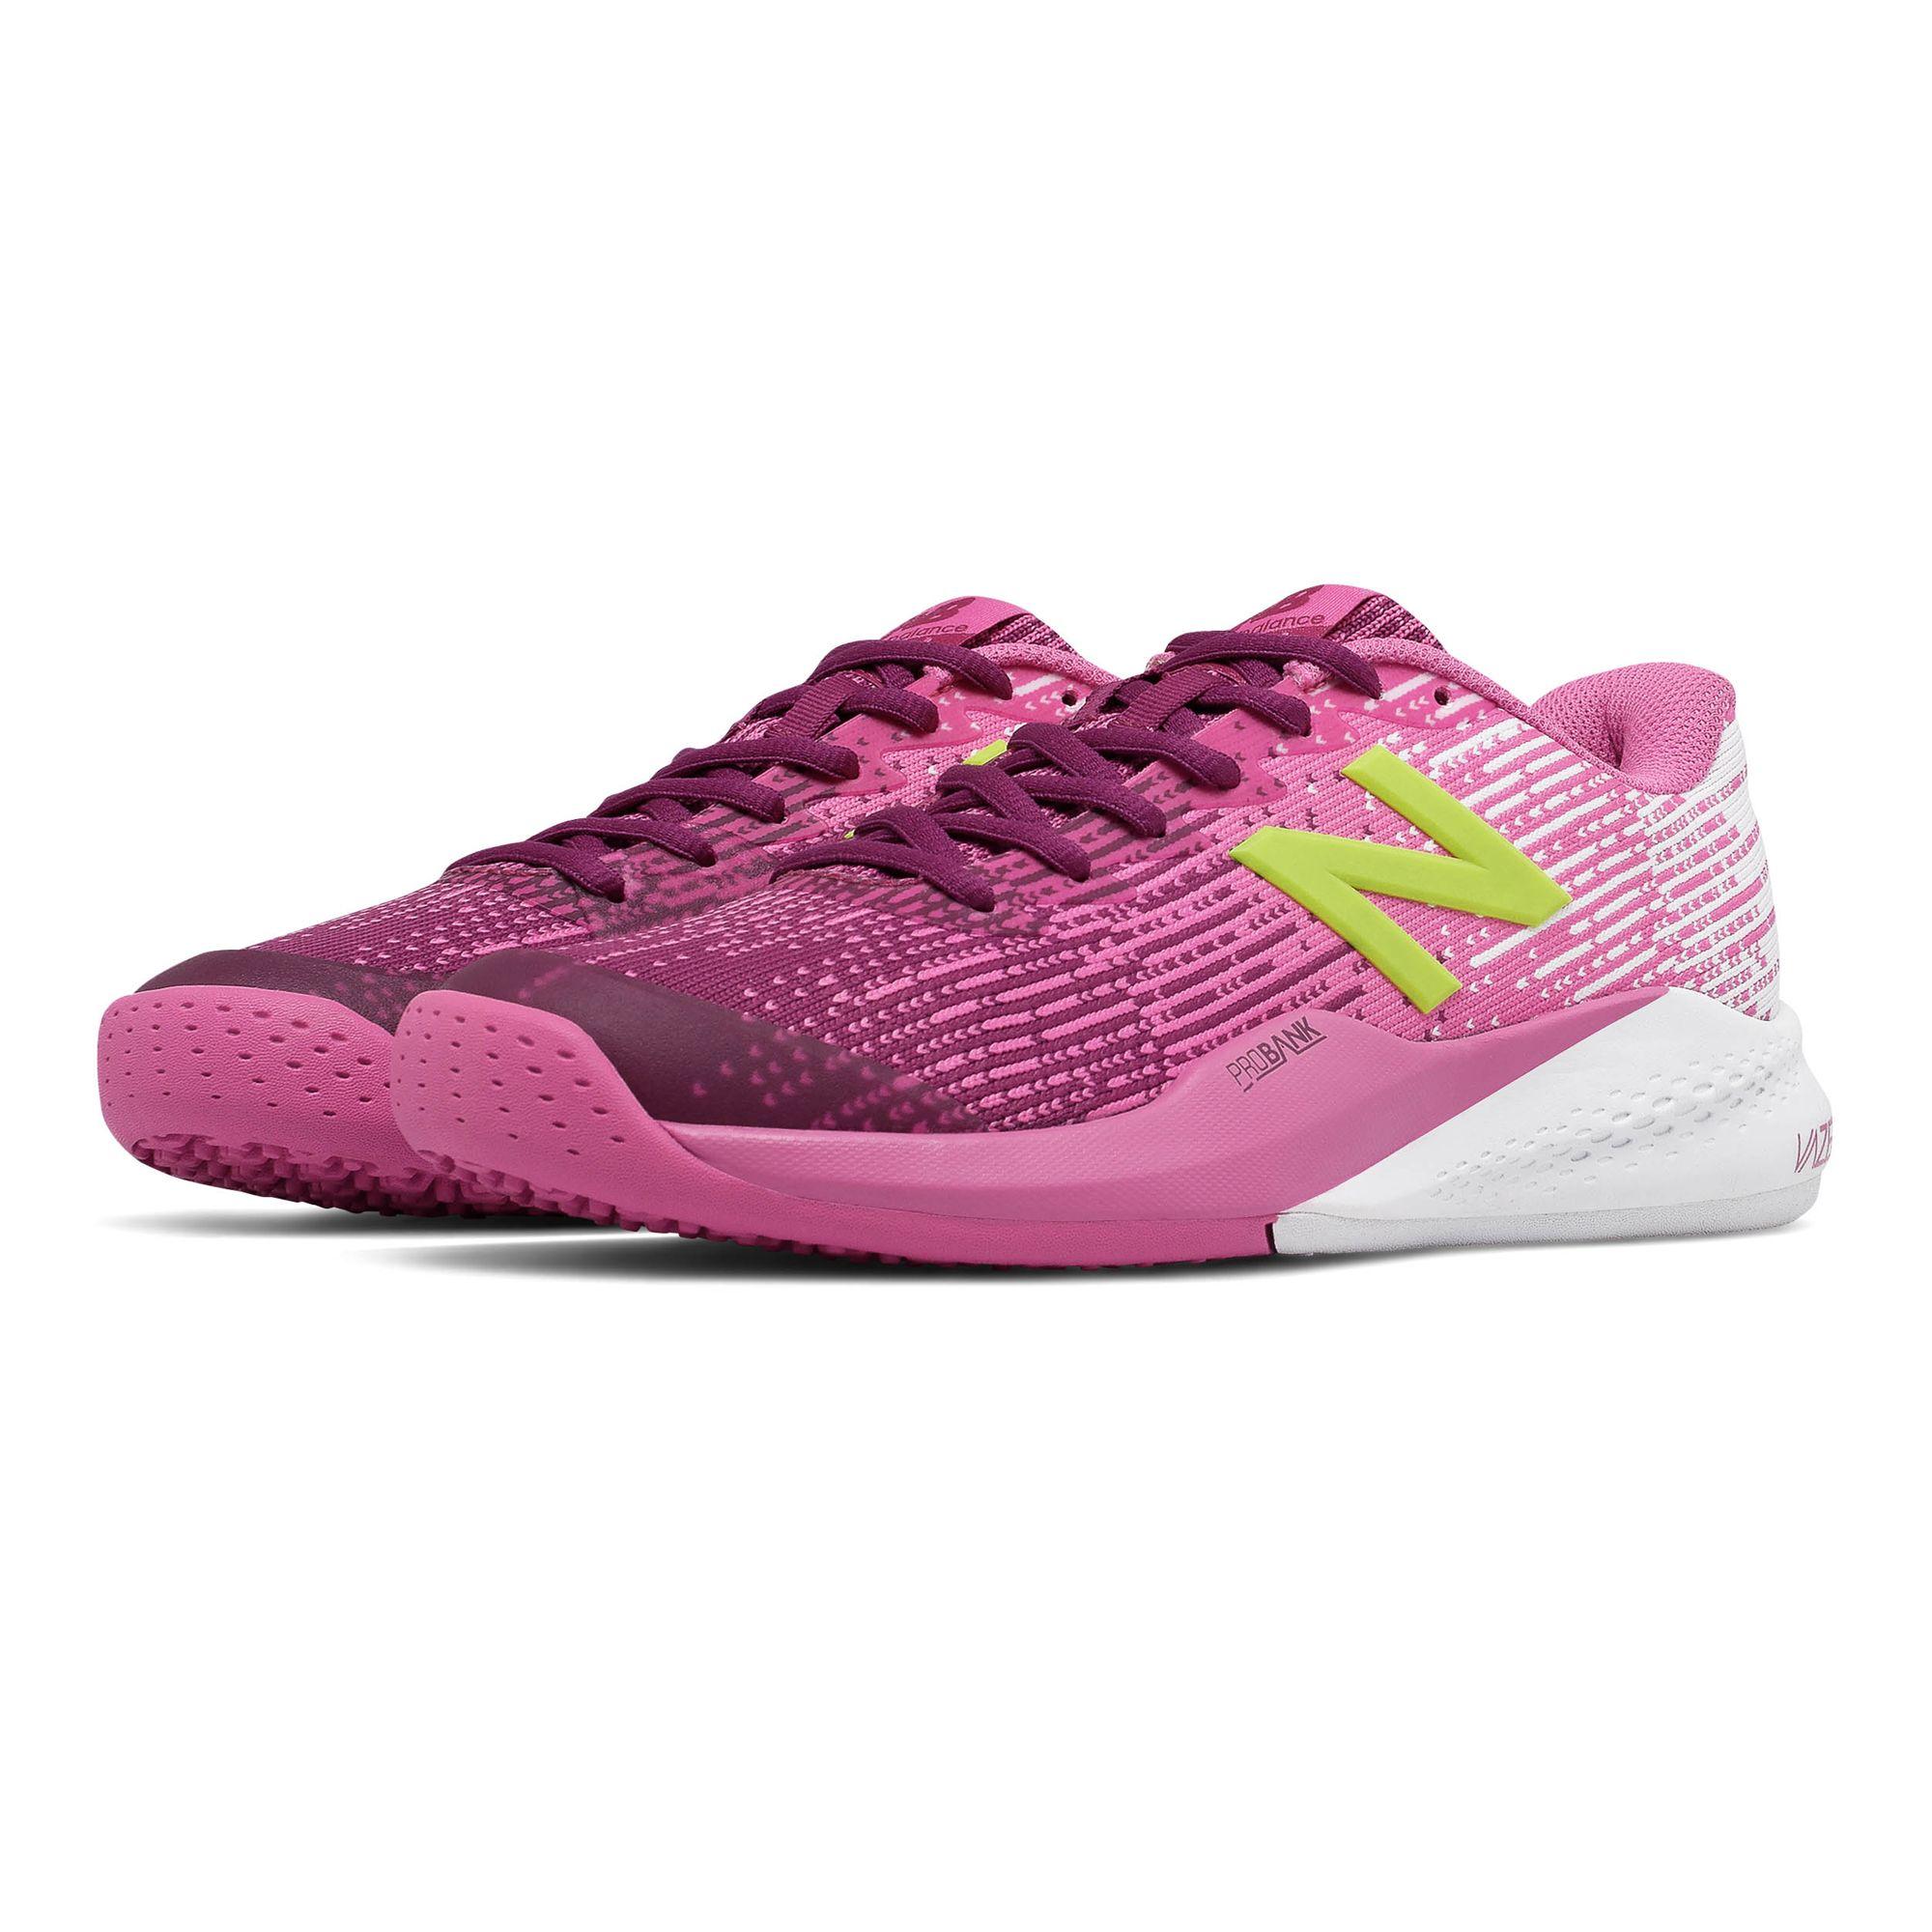 Stylish Ladies Golf Shoes